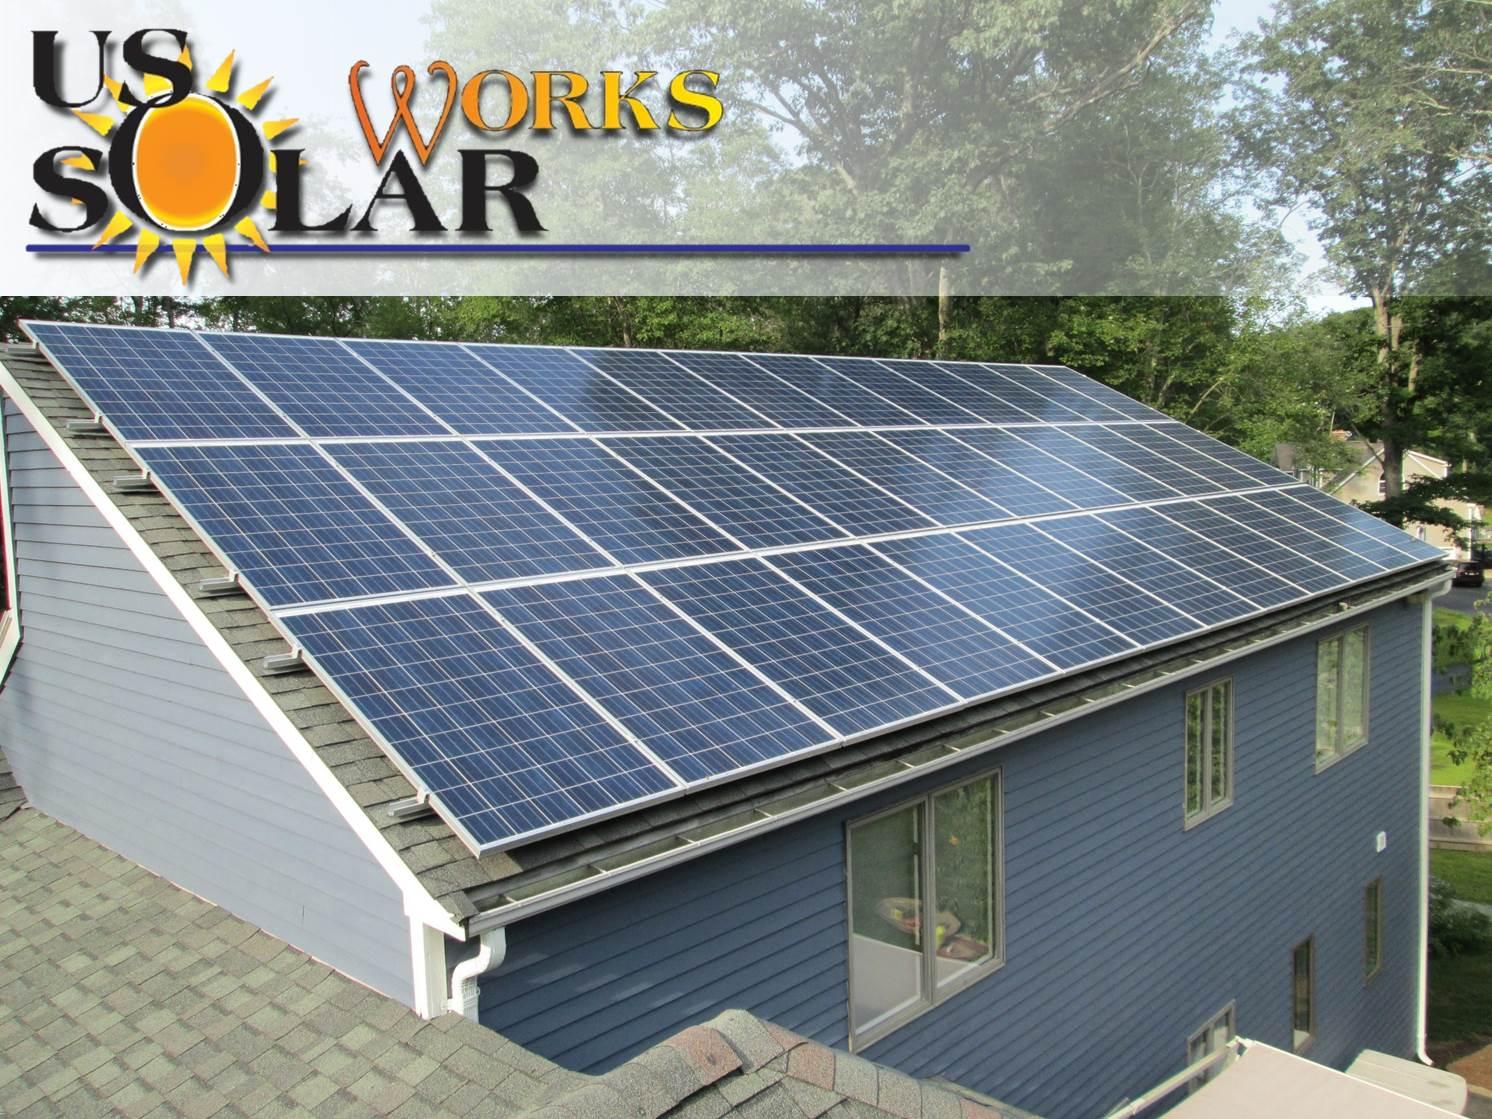 Residential solar array in Attleboro, MA